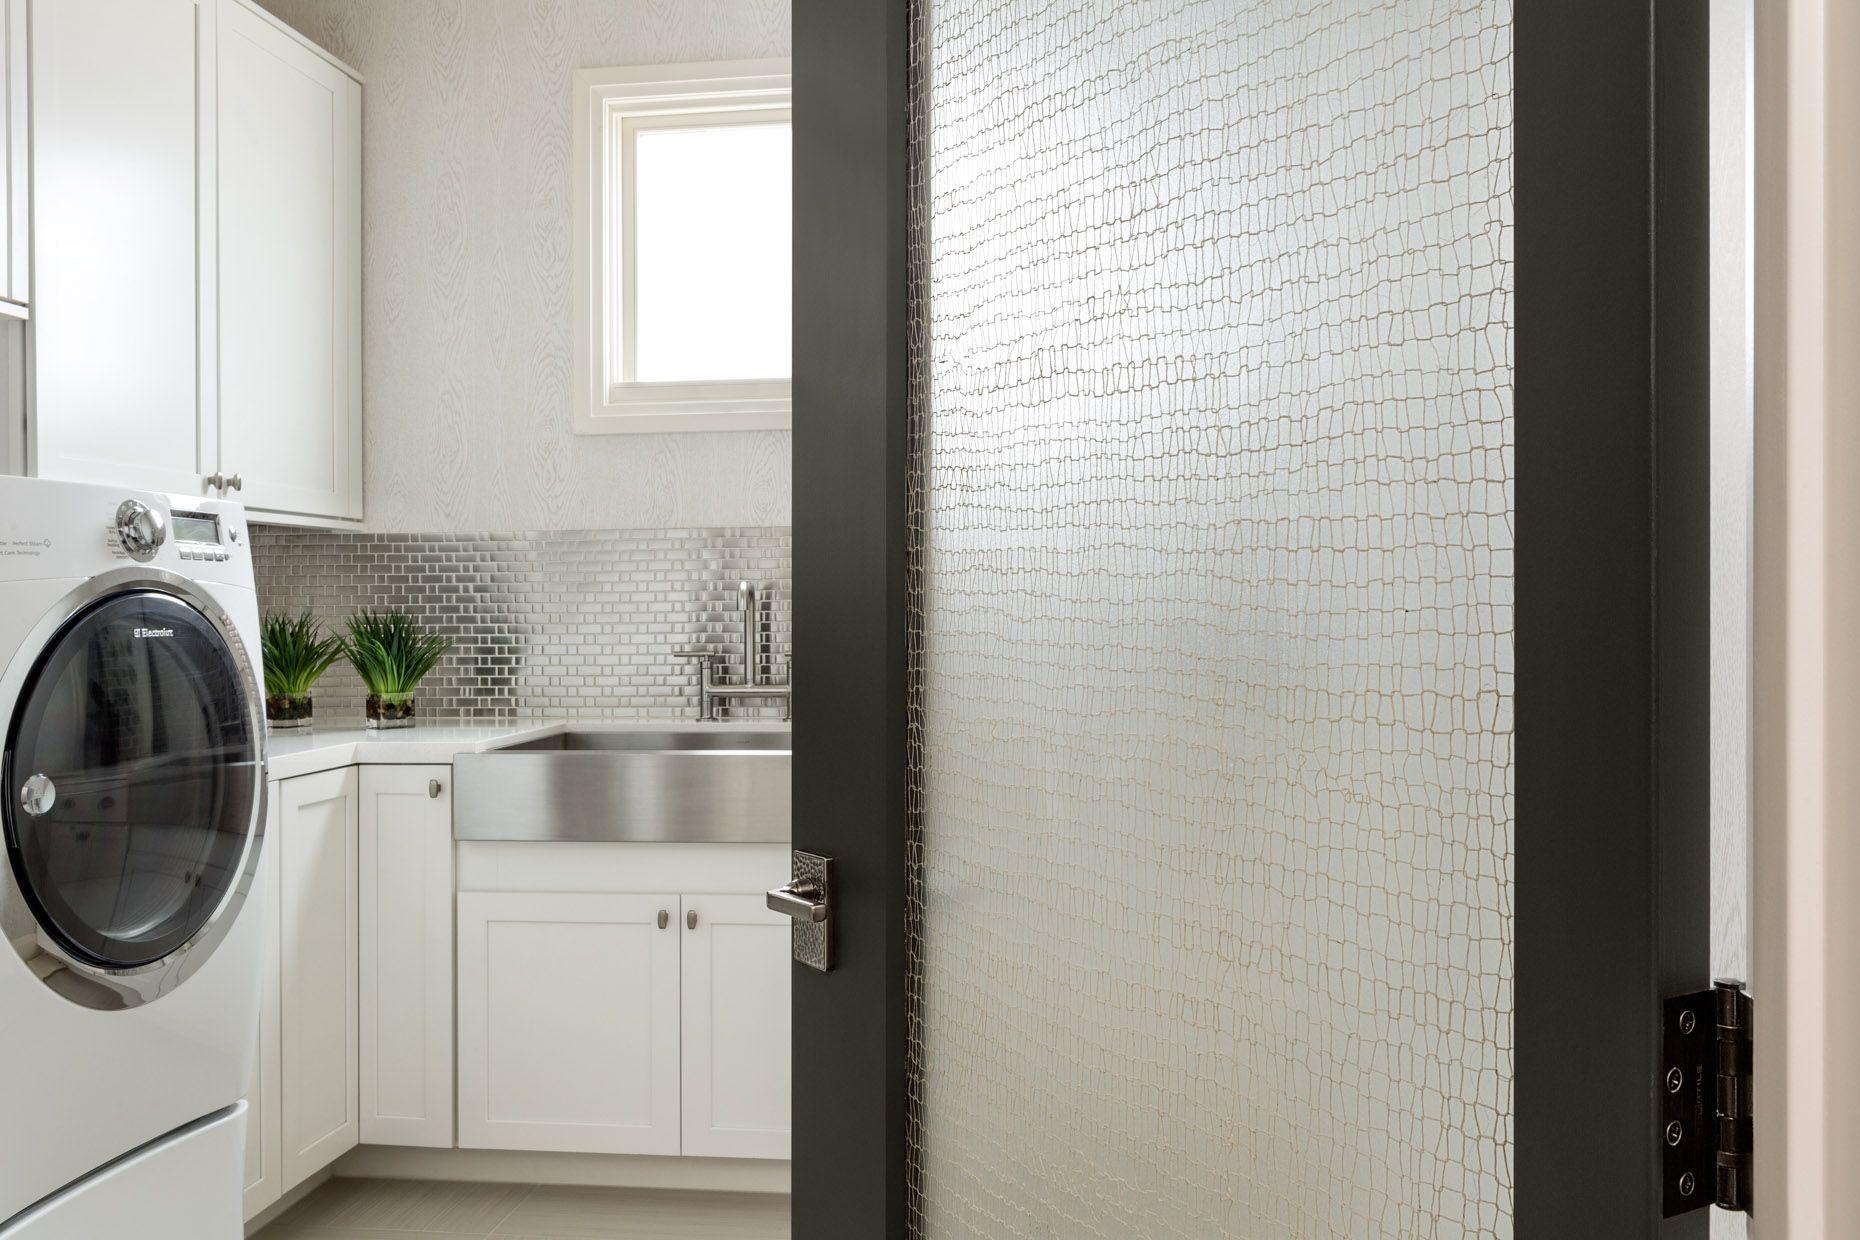 Resin Kitchen Floor Trustile Modern Door Collection Tm1000 In Mdf And 3form Resin